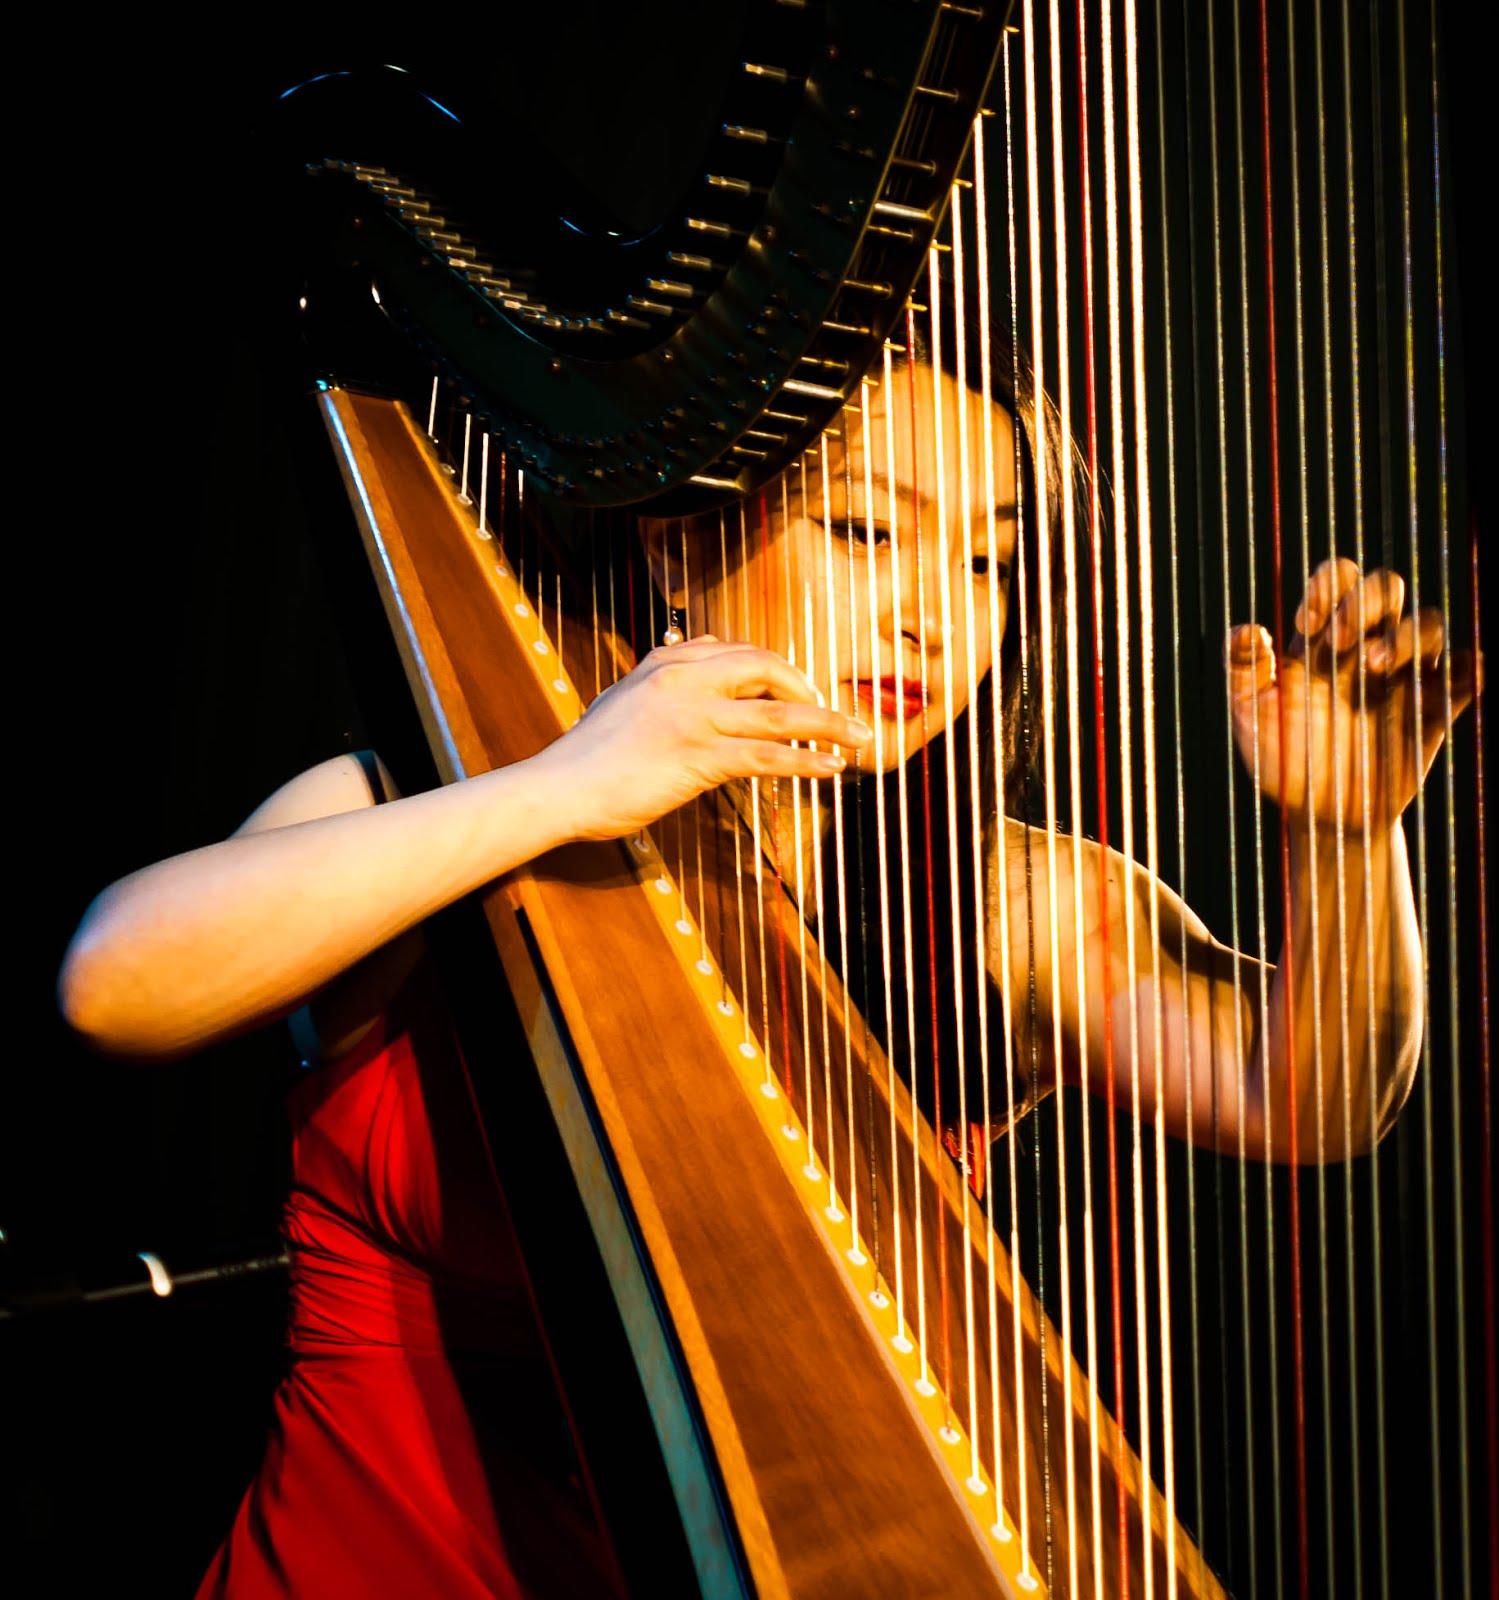 Latest News and reviews of Concert Harpist Teresa Suen-Campbell